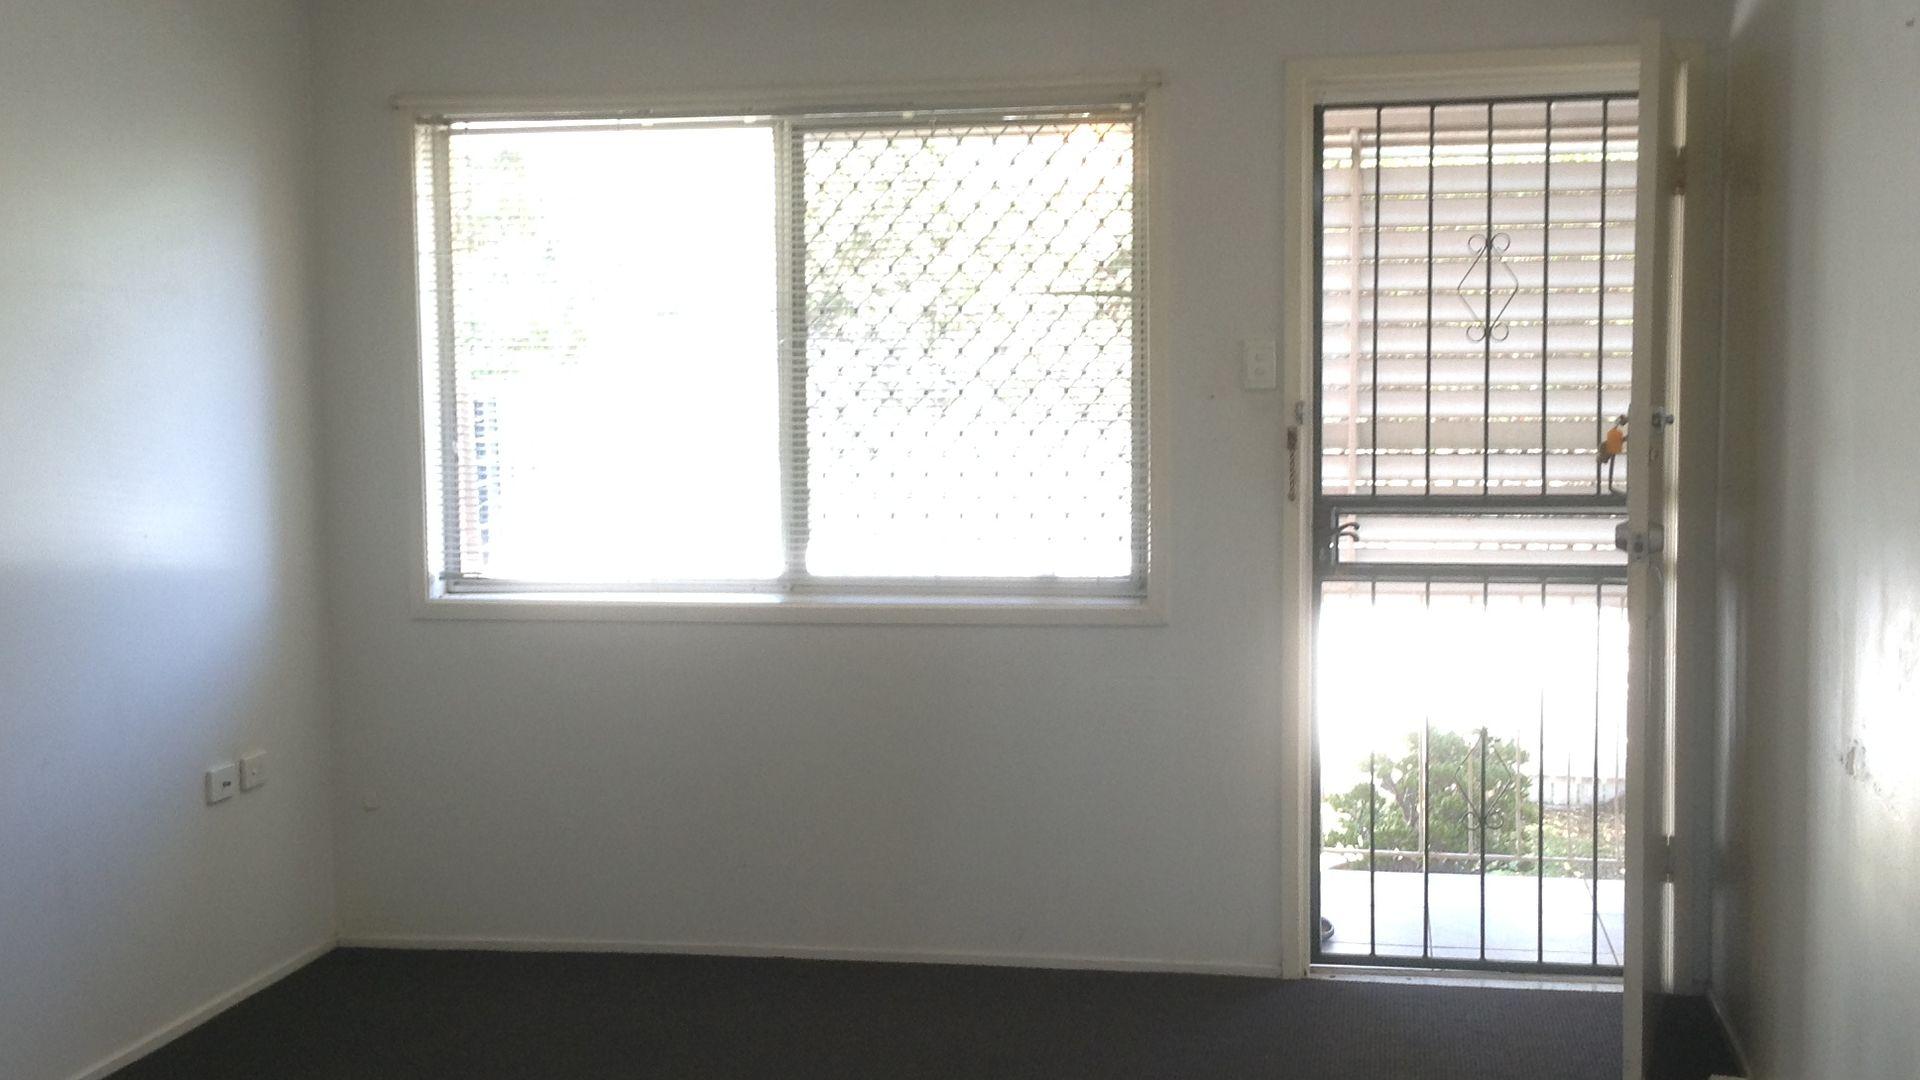 4/57 Fairbank Street, Sunnybank Hills QLD 4109, Image 1